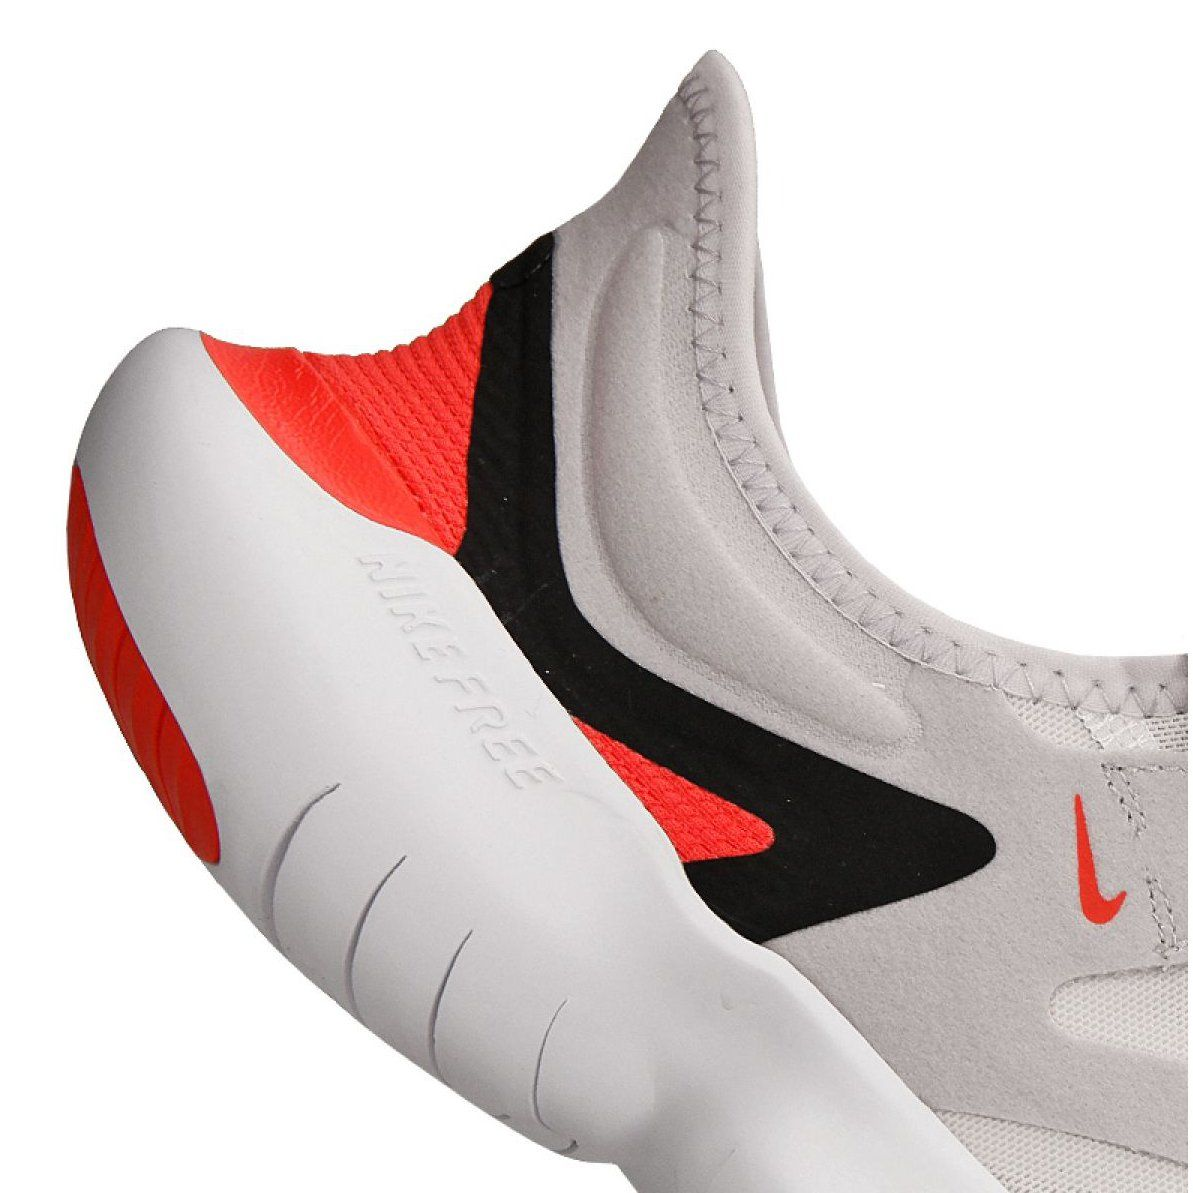 Buty Biegowe Nike Free Rn 5 0 M Aq1289 004 Szare Running Shoes Nike Free Nike Free Running Shoes Nike